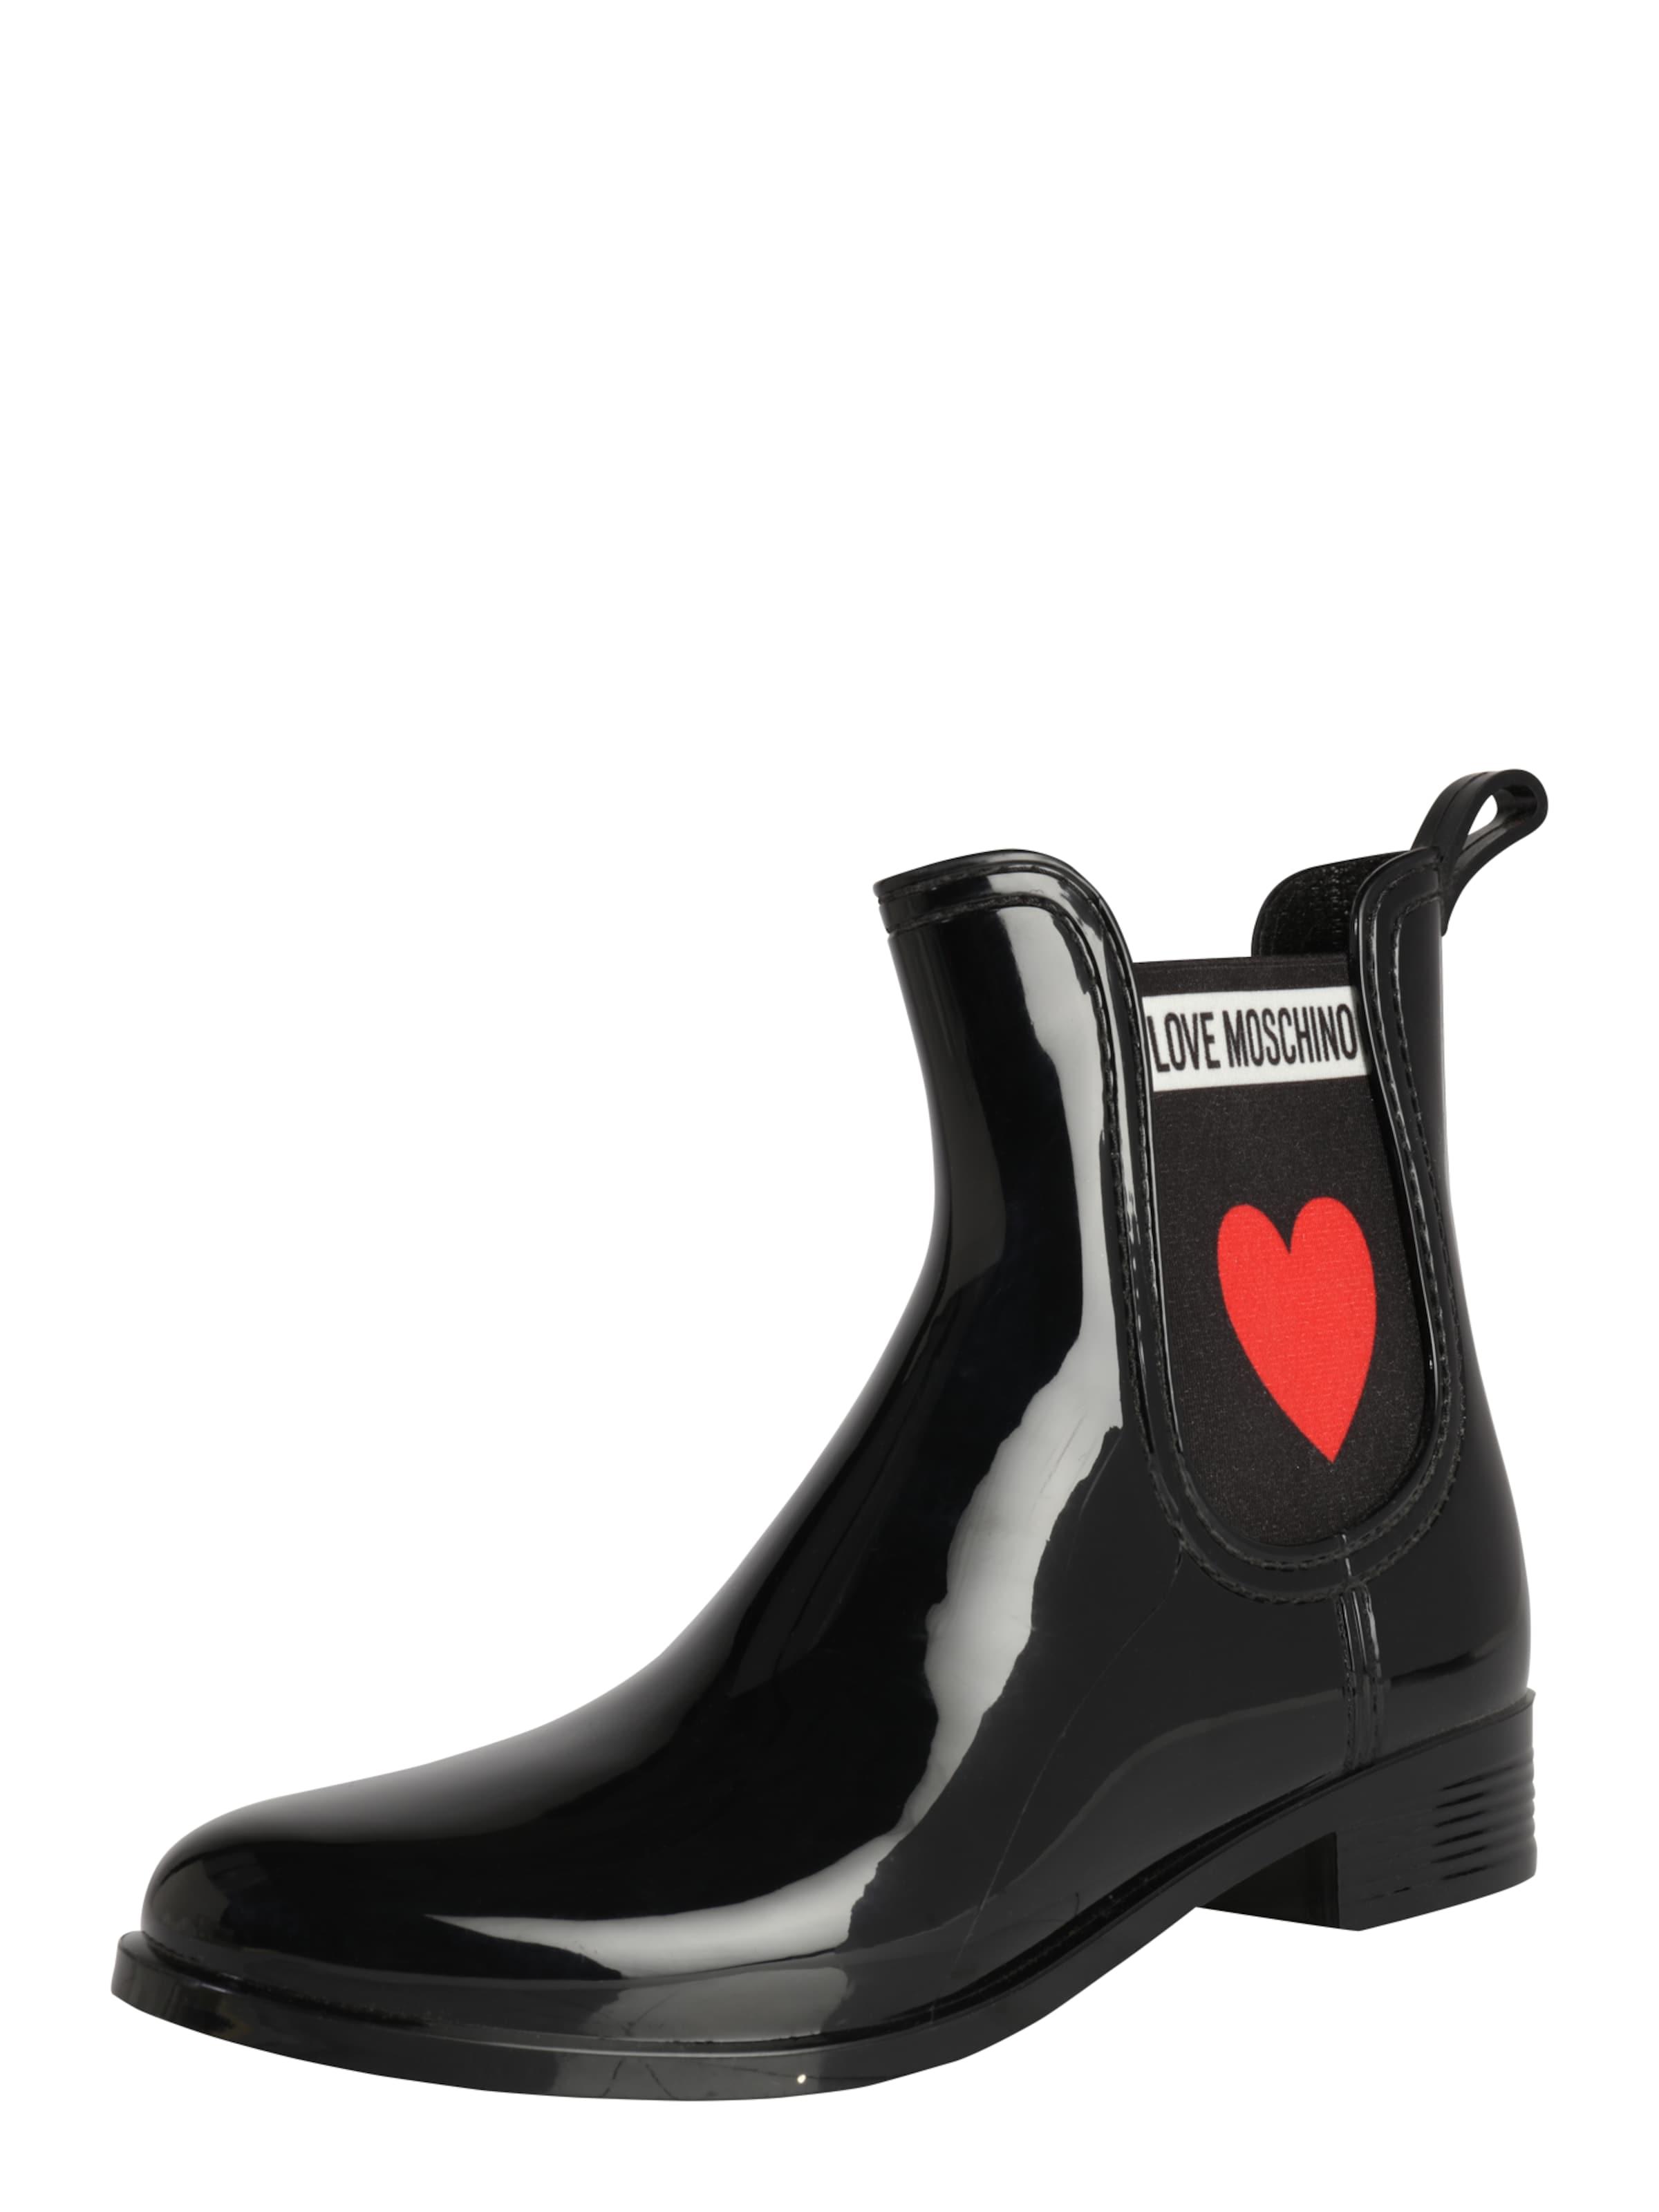 Love Moschino | Gummistiefel 'RAIN PLAIN' Schuhe Gut getragene Schuhe